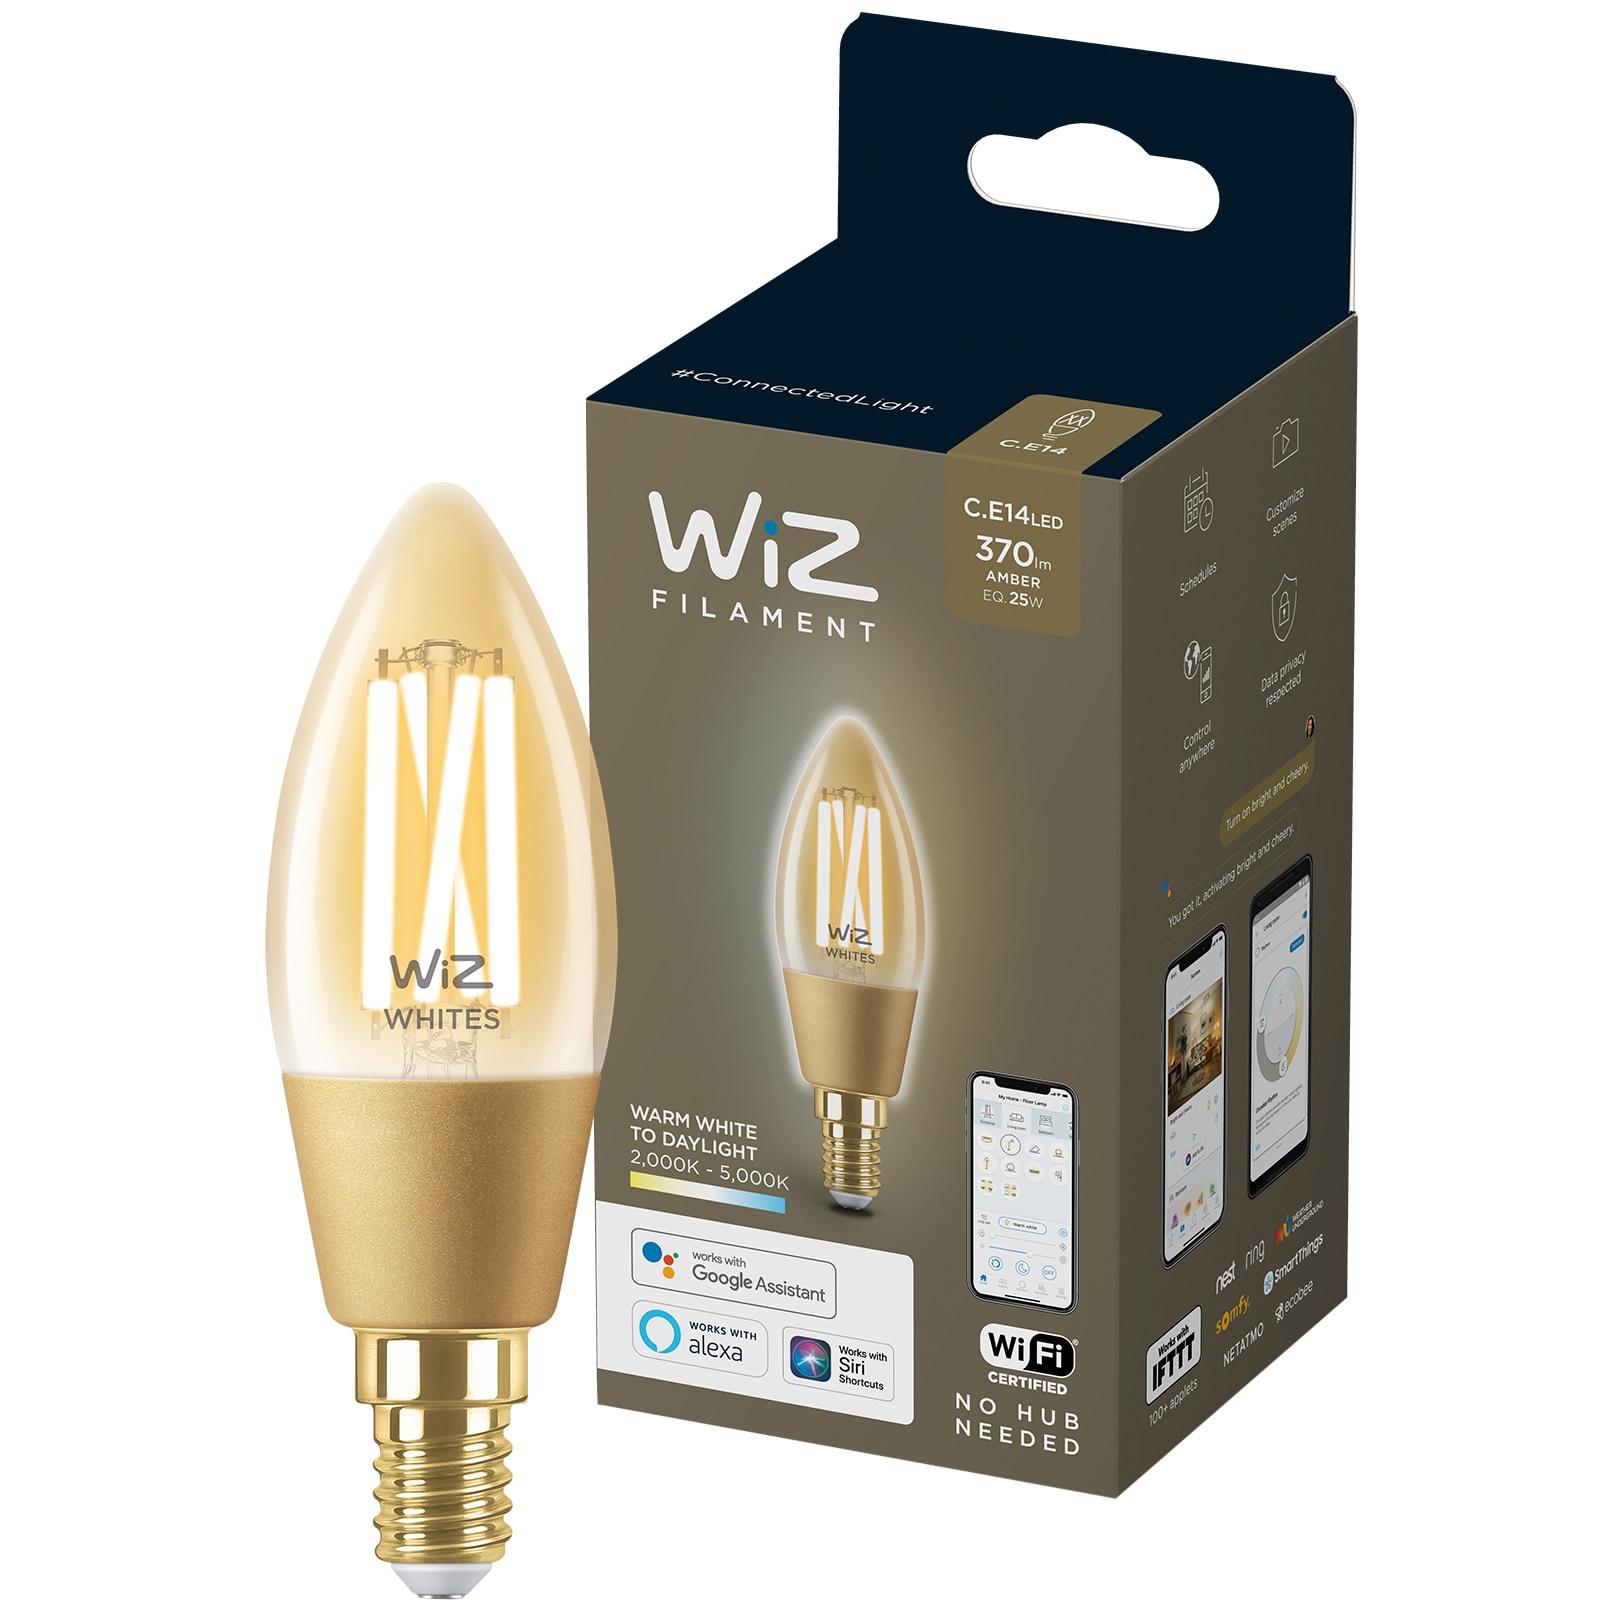 Fotografie Bec LED inteligent vintage WiZ Filament Whites, Wi-Fi, C35, E14, 4.9W (25W), 370 lm, temperatura lumina reglabila (2000K-5000K), compatibil Google Assistant/Alexa/Siri